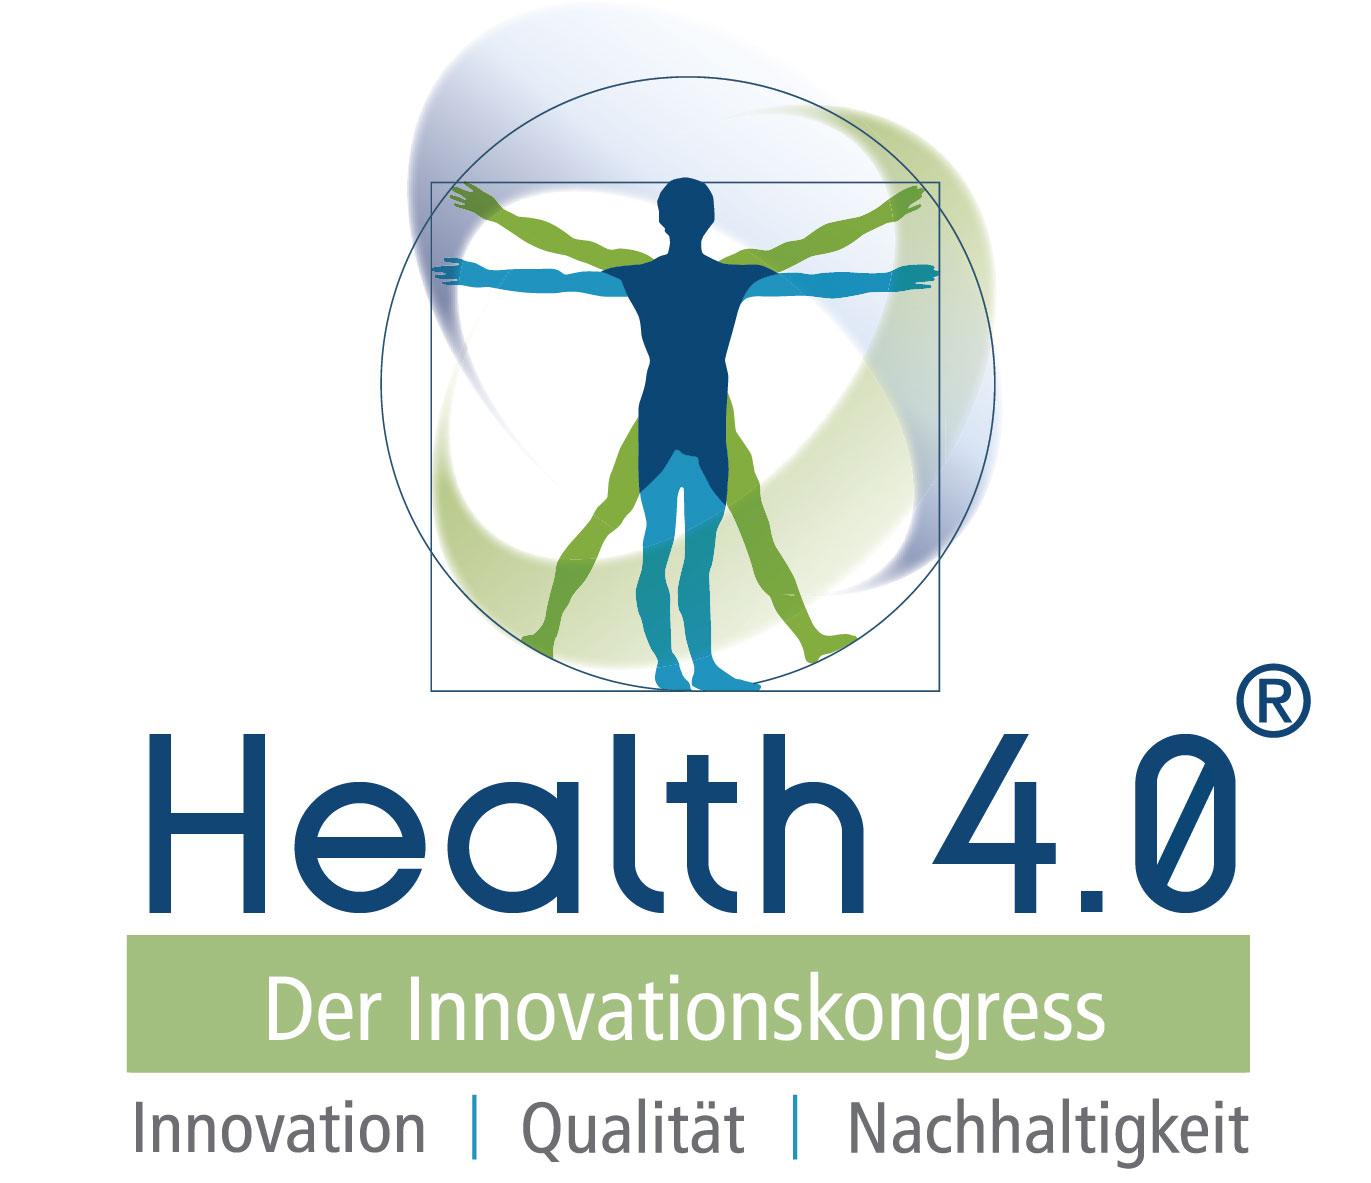 HEALTH 4.0 Podiumsdiskussion mit Prof. I. Iossifidis